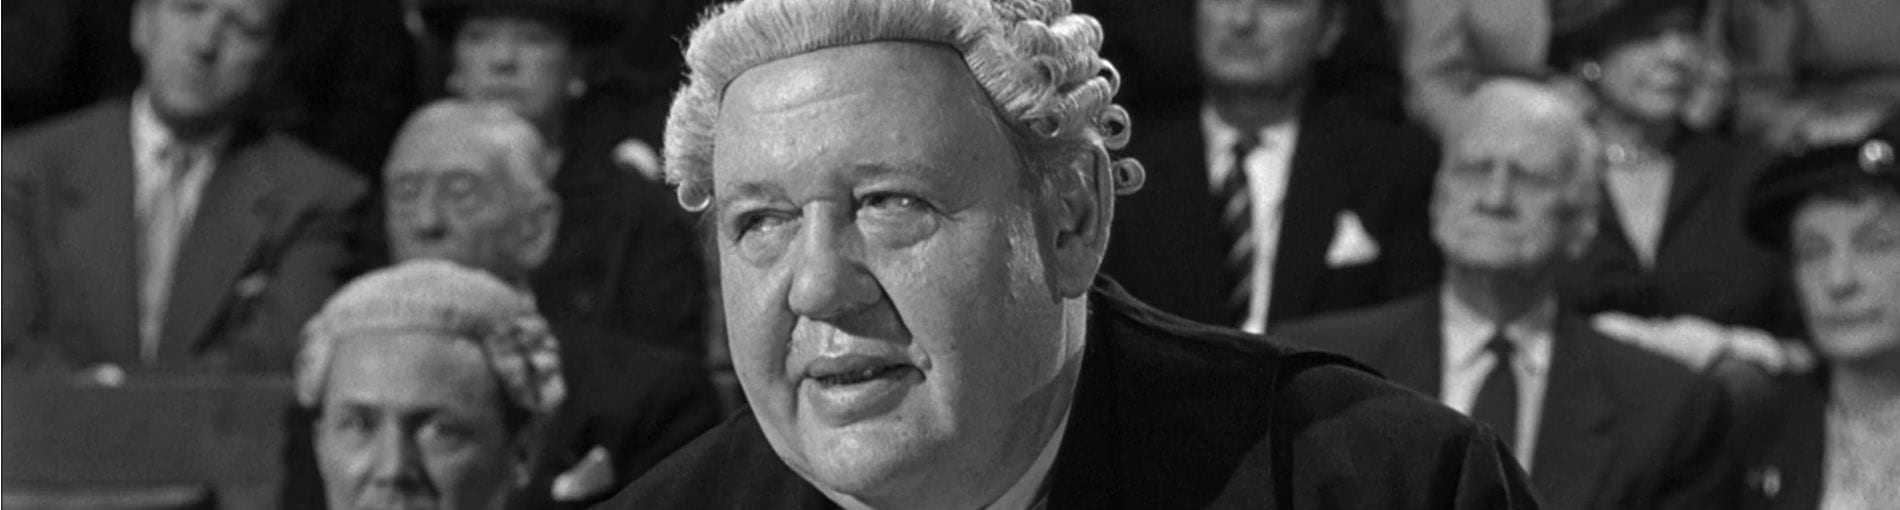 TOP: Películas basadas en obras de Agatha Christie